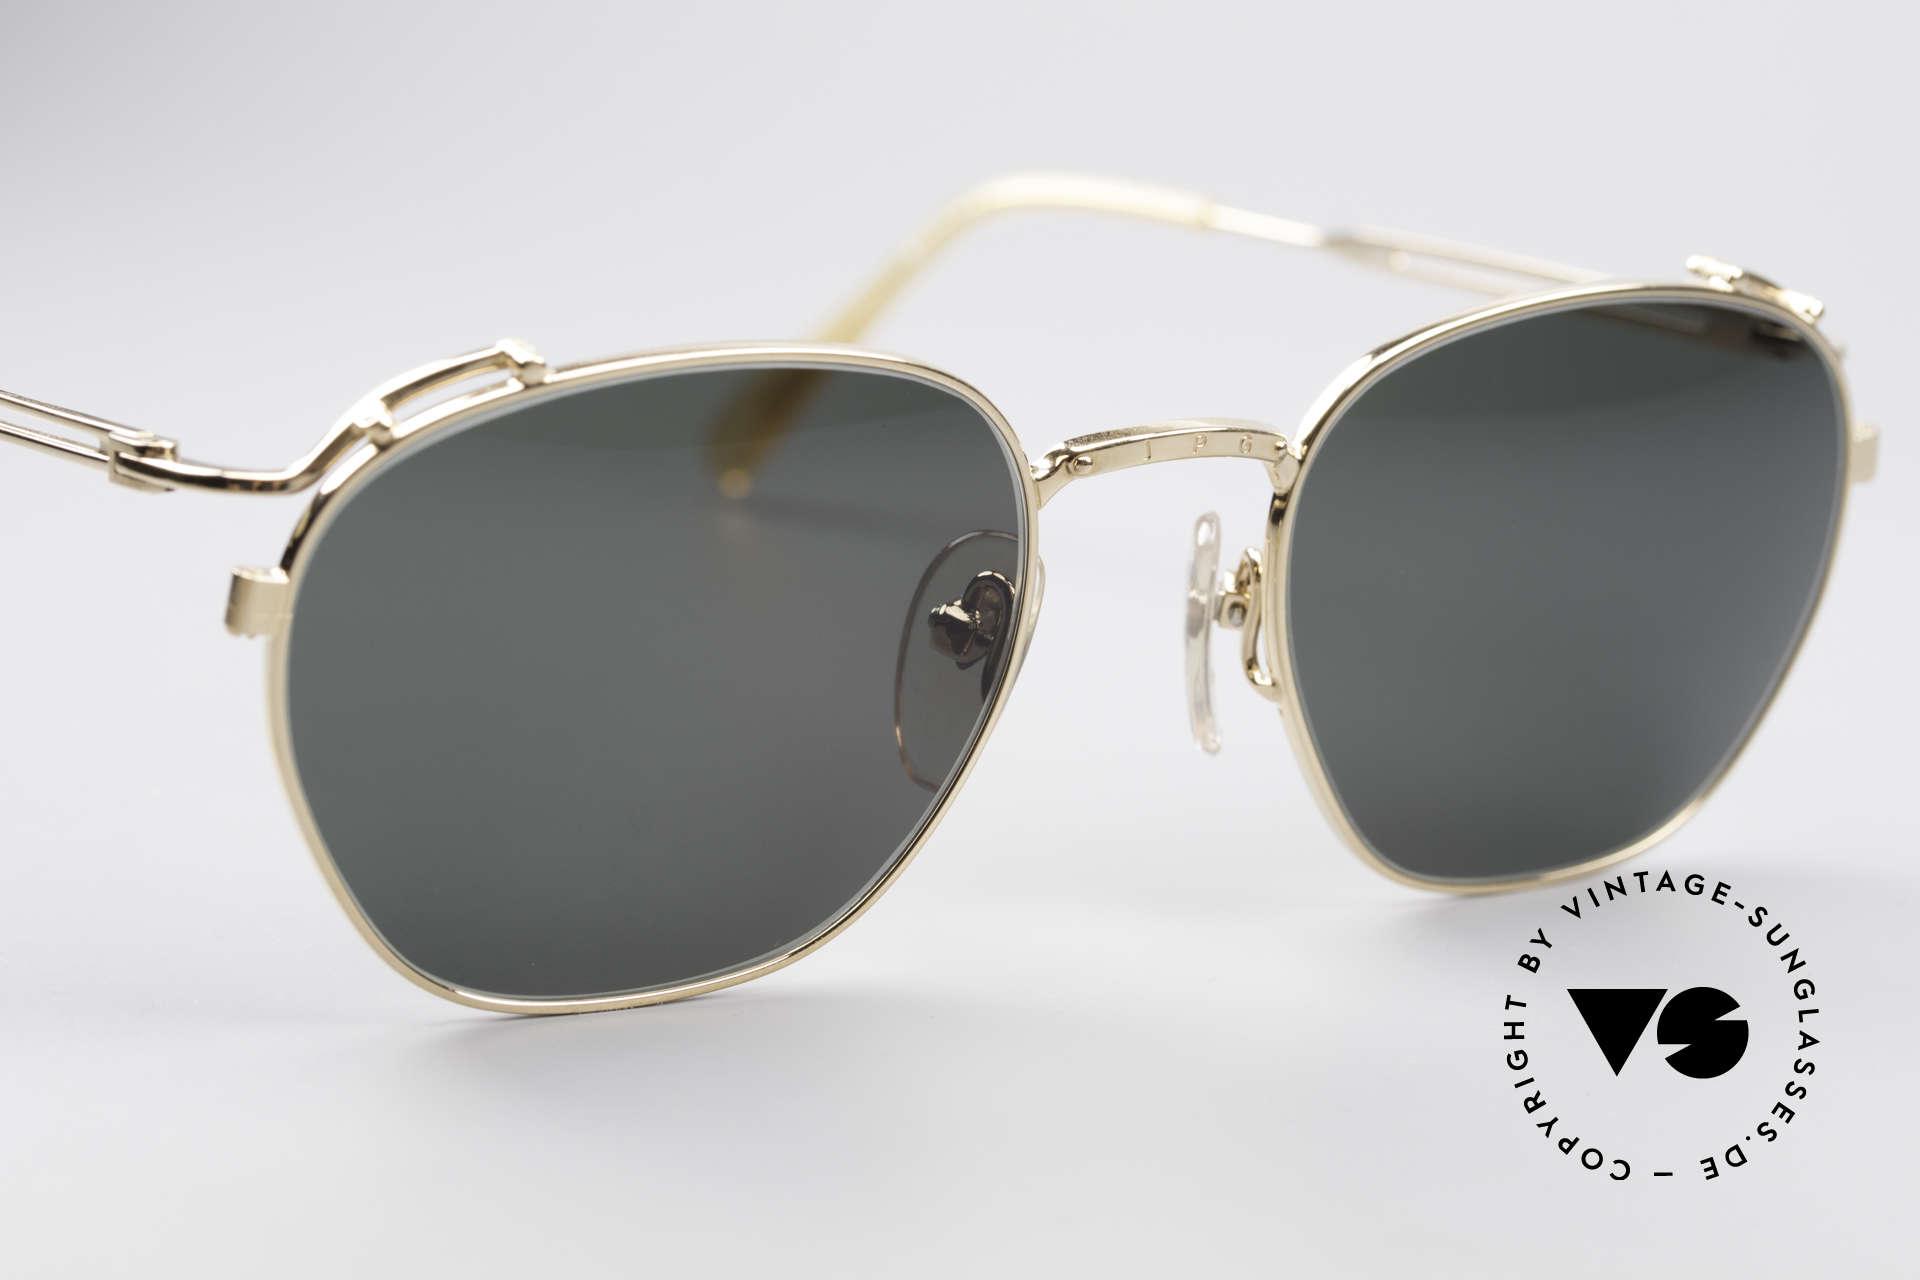 Jean Paul Gaultier 55-3173 90's Gold-Plated Sunglasses, NO RETRO EYEWEAR; a true vintage ORIGINAL!, Made for Men and Women